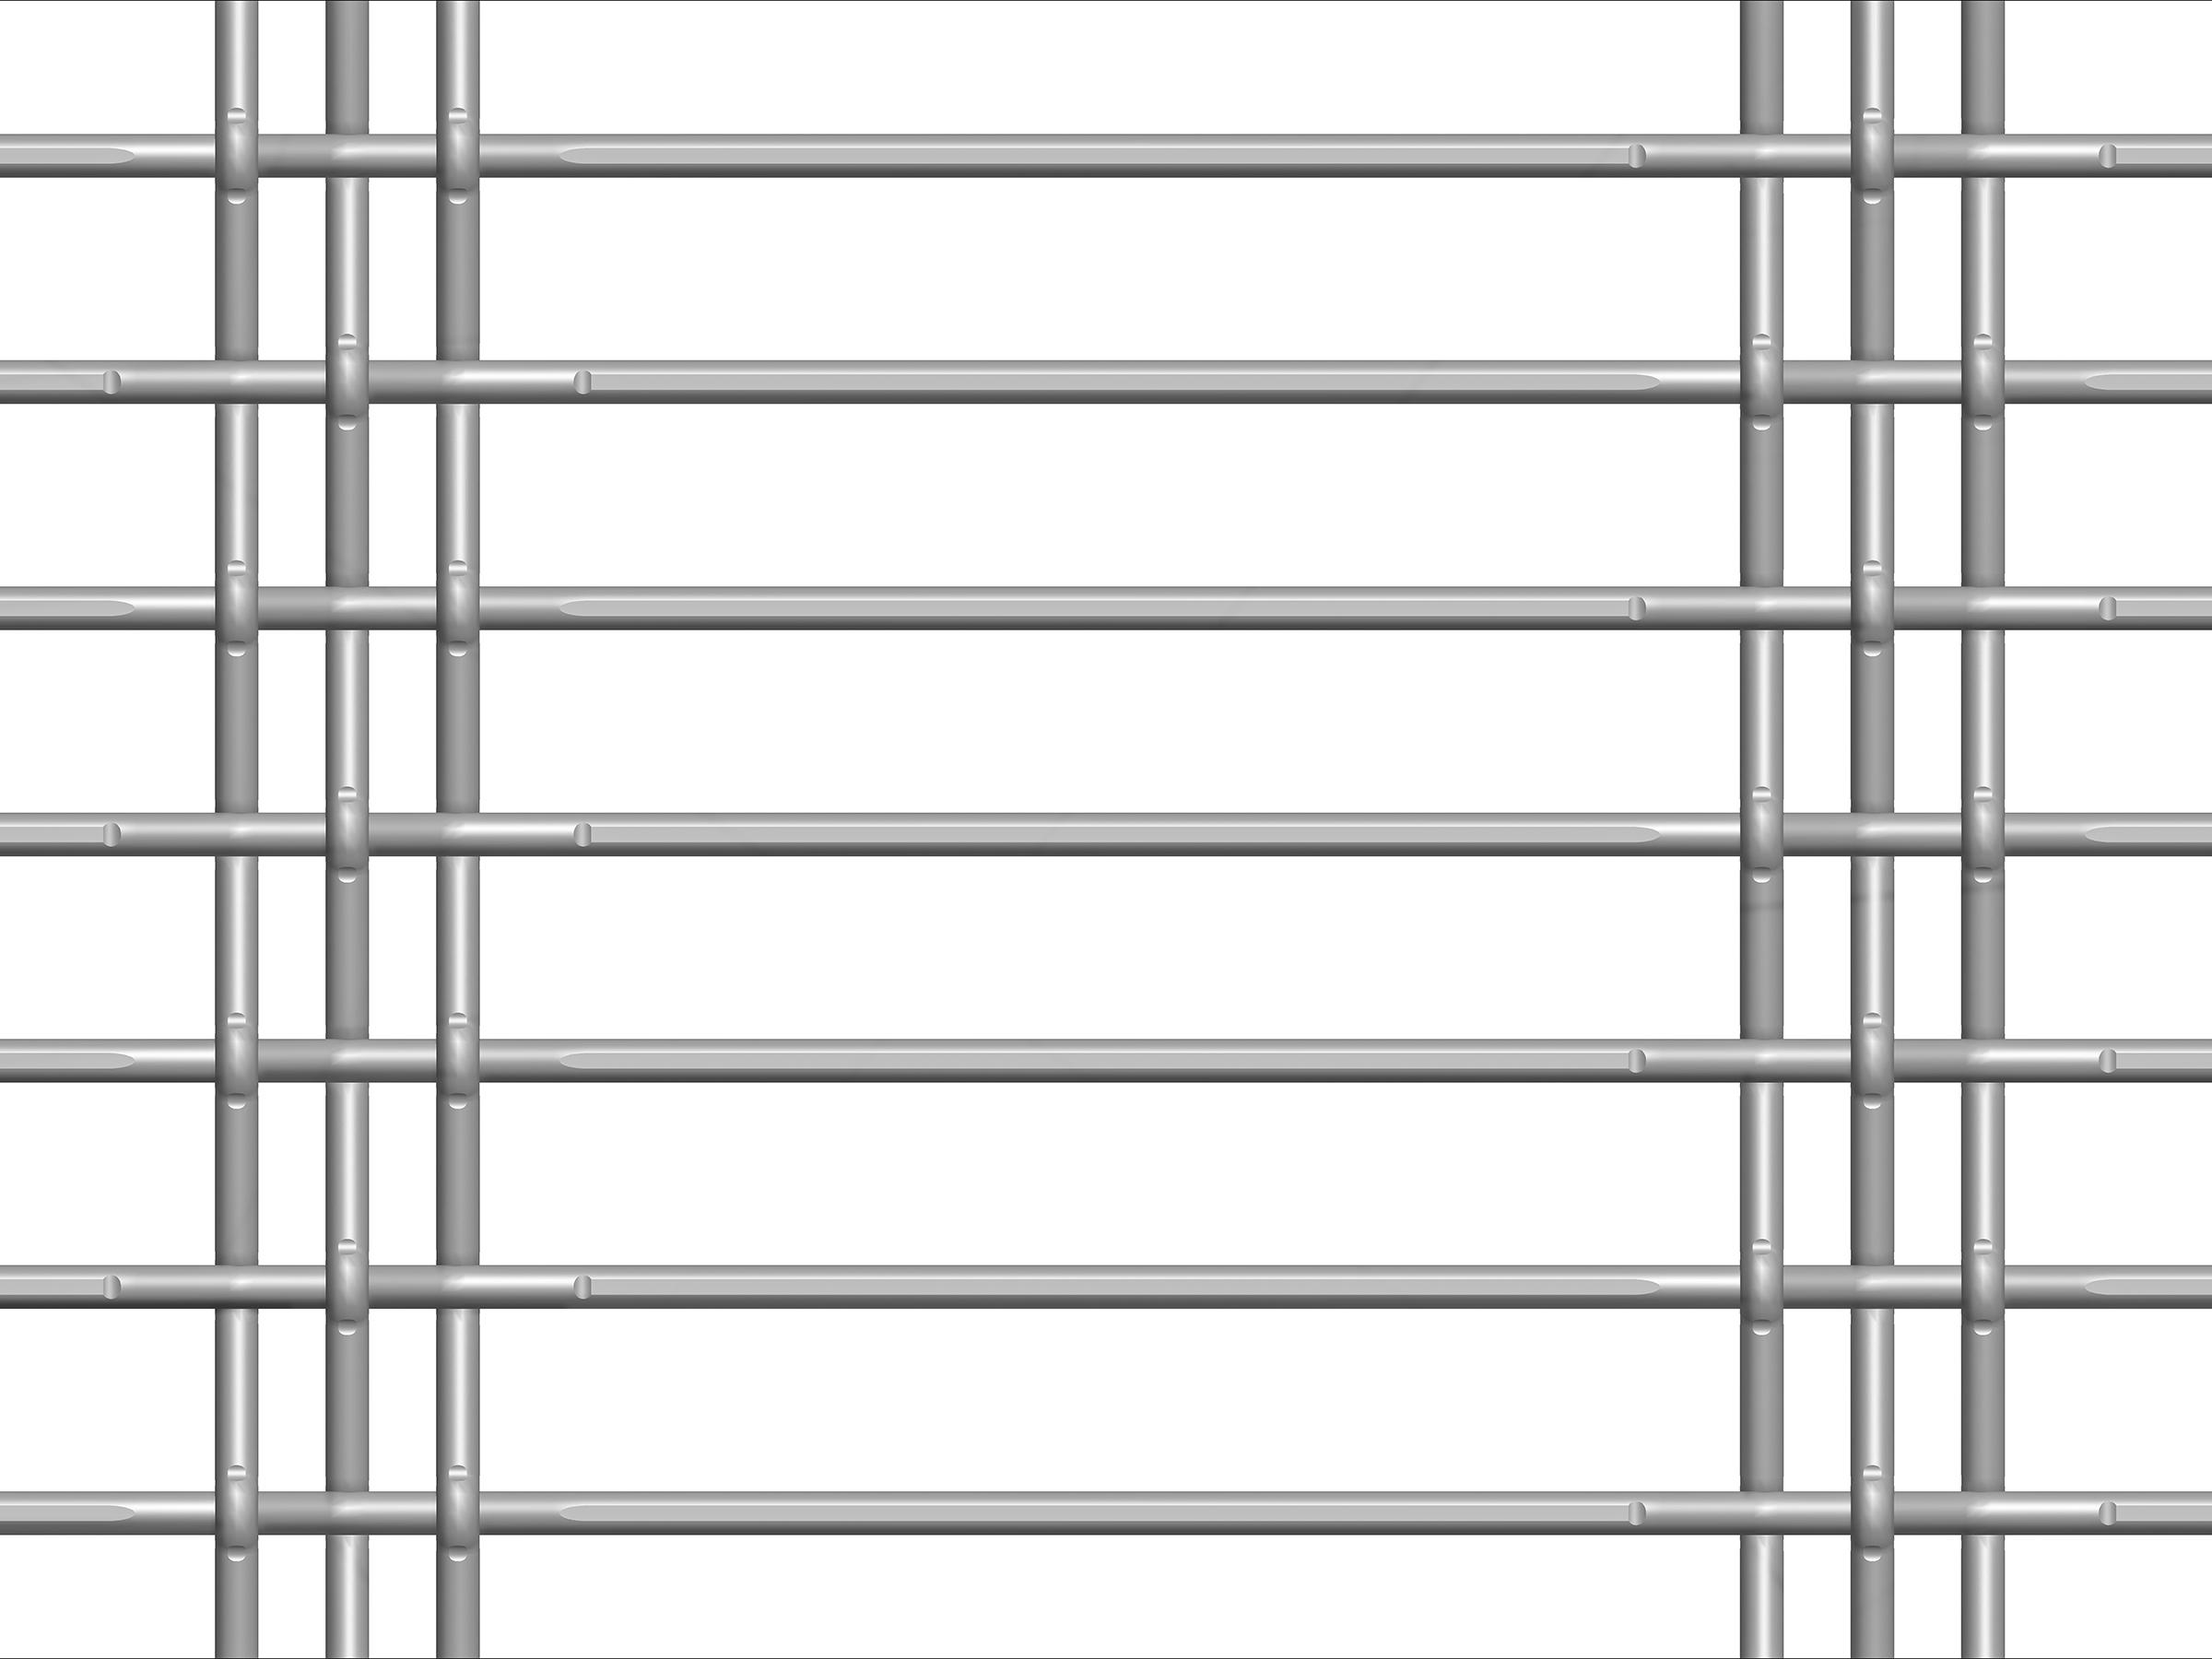 M13Z-357 Triple Shute woven wire mesh